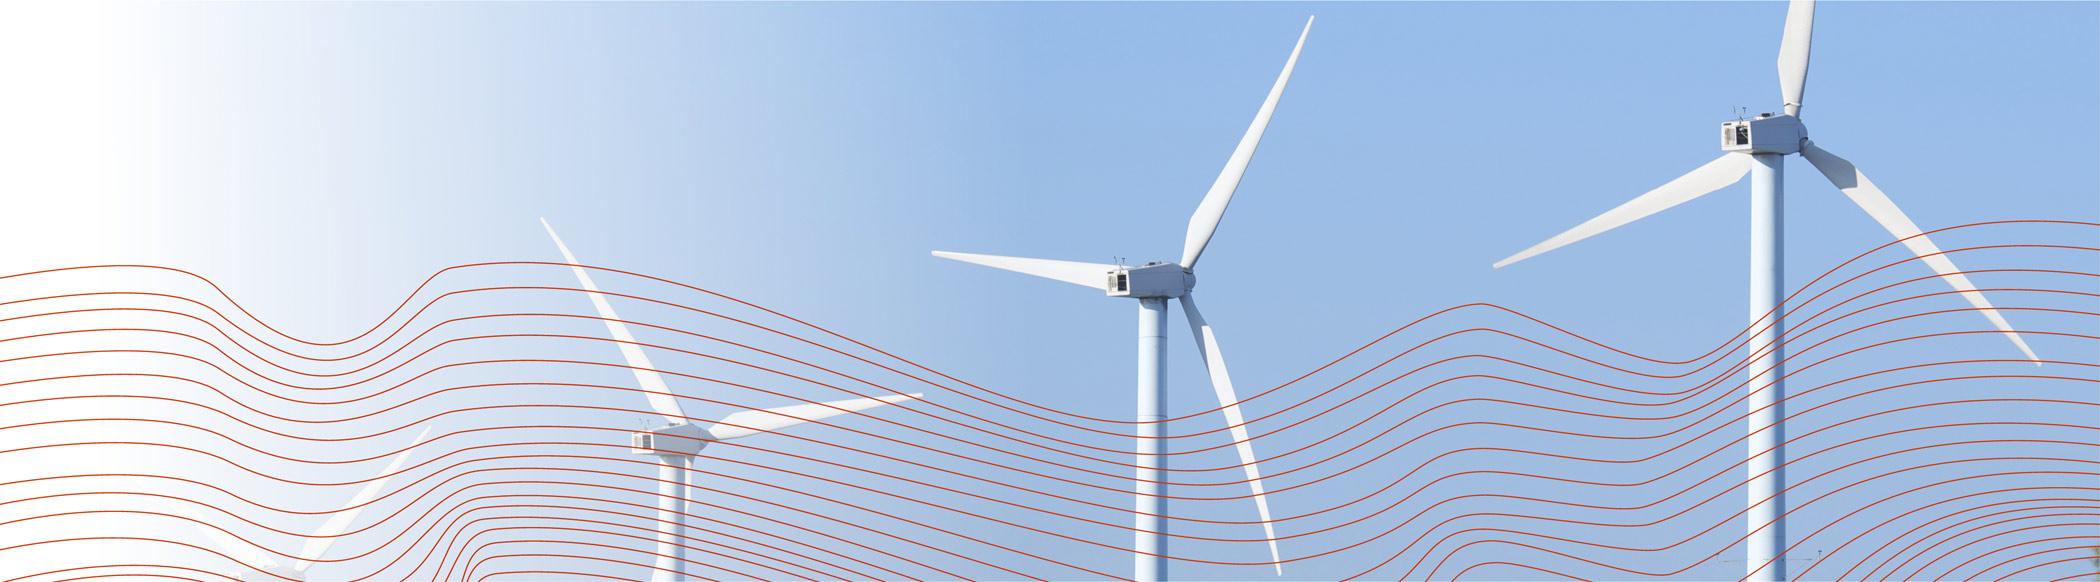 Muri Energie Forum – Windenergie